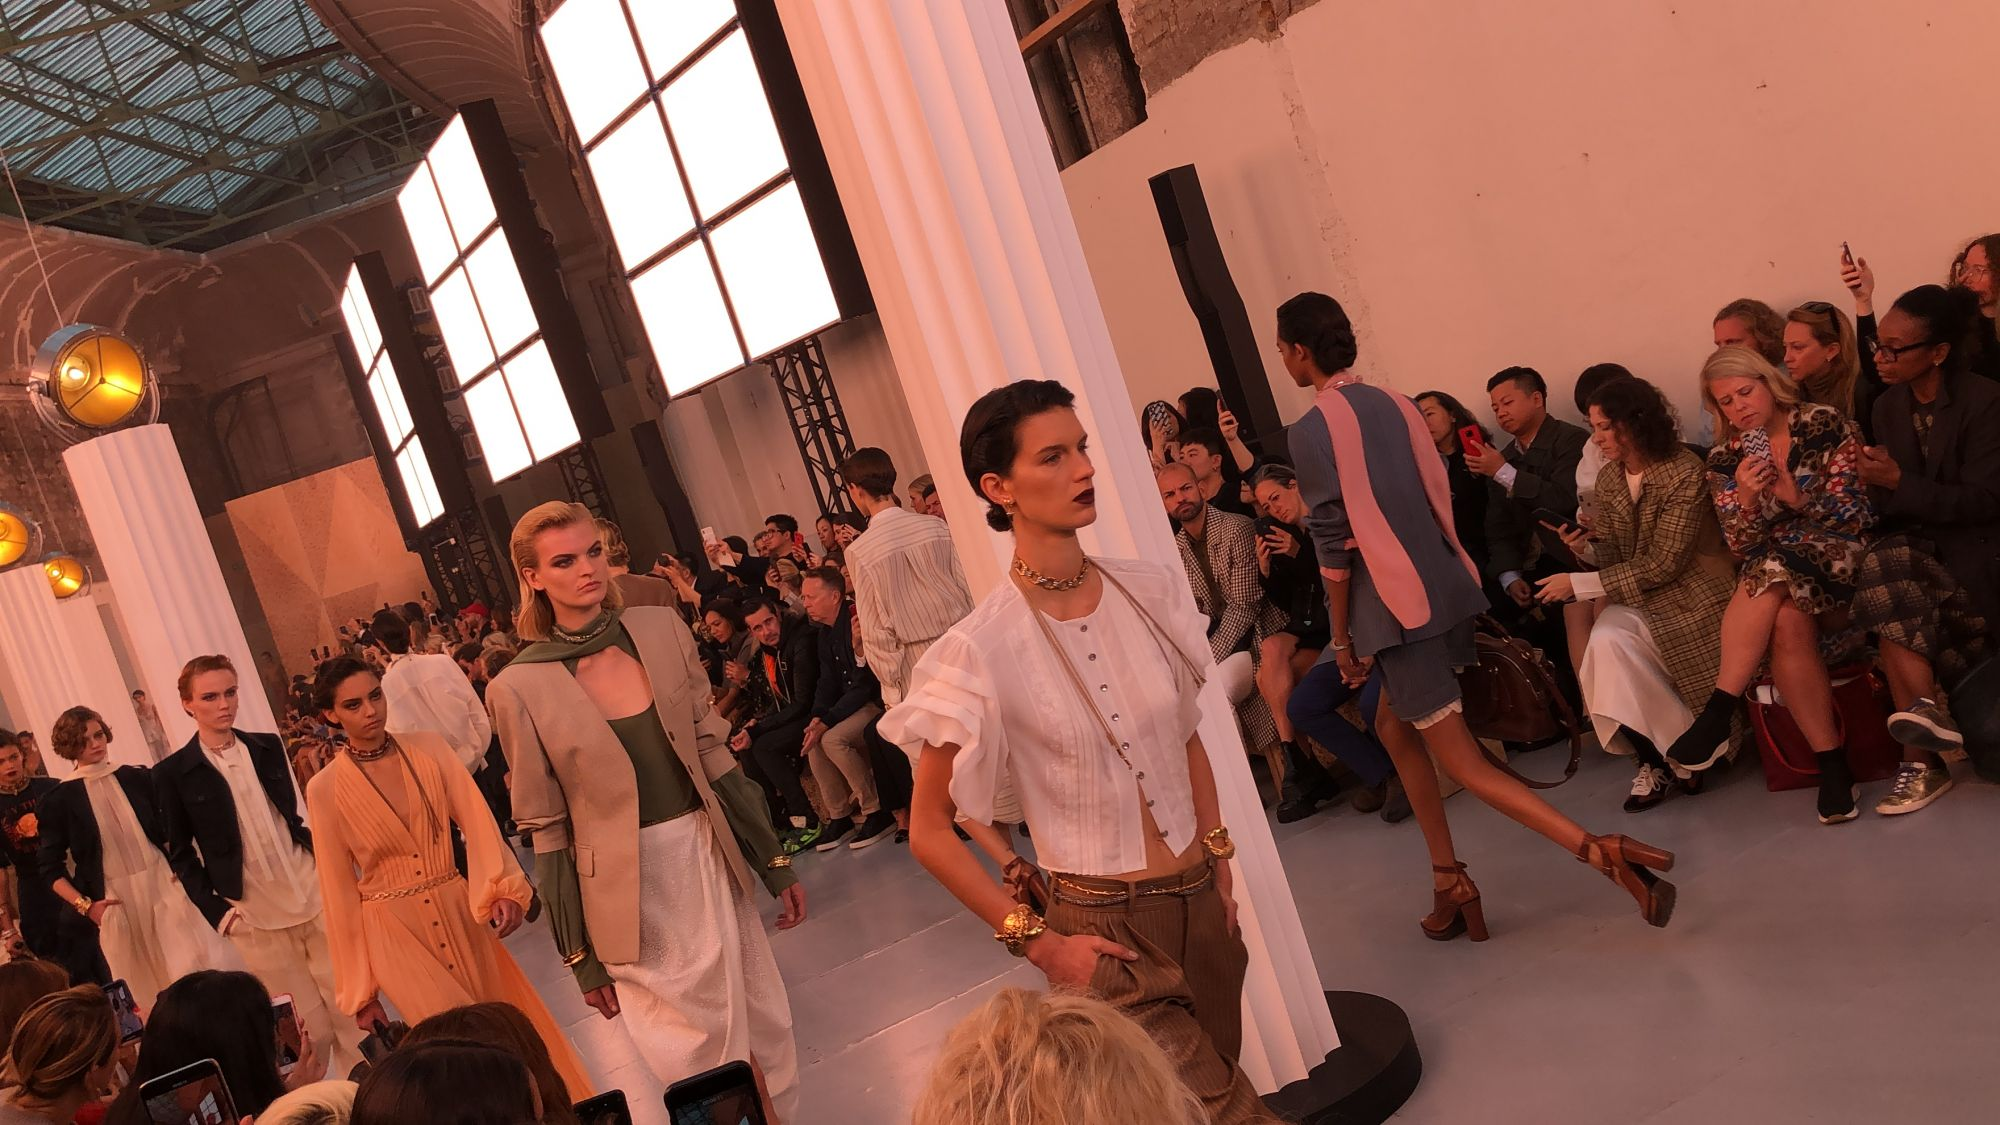 Paris Fashion Week Spring/Summer 2020: Day 2-3 Highlights